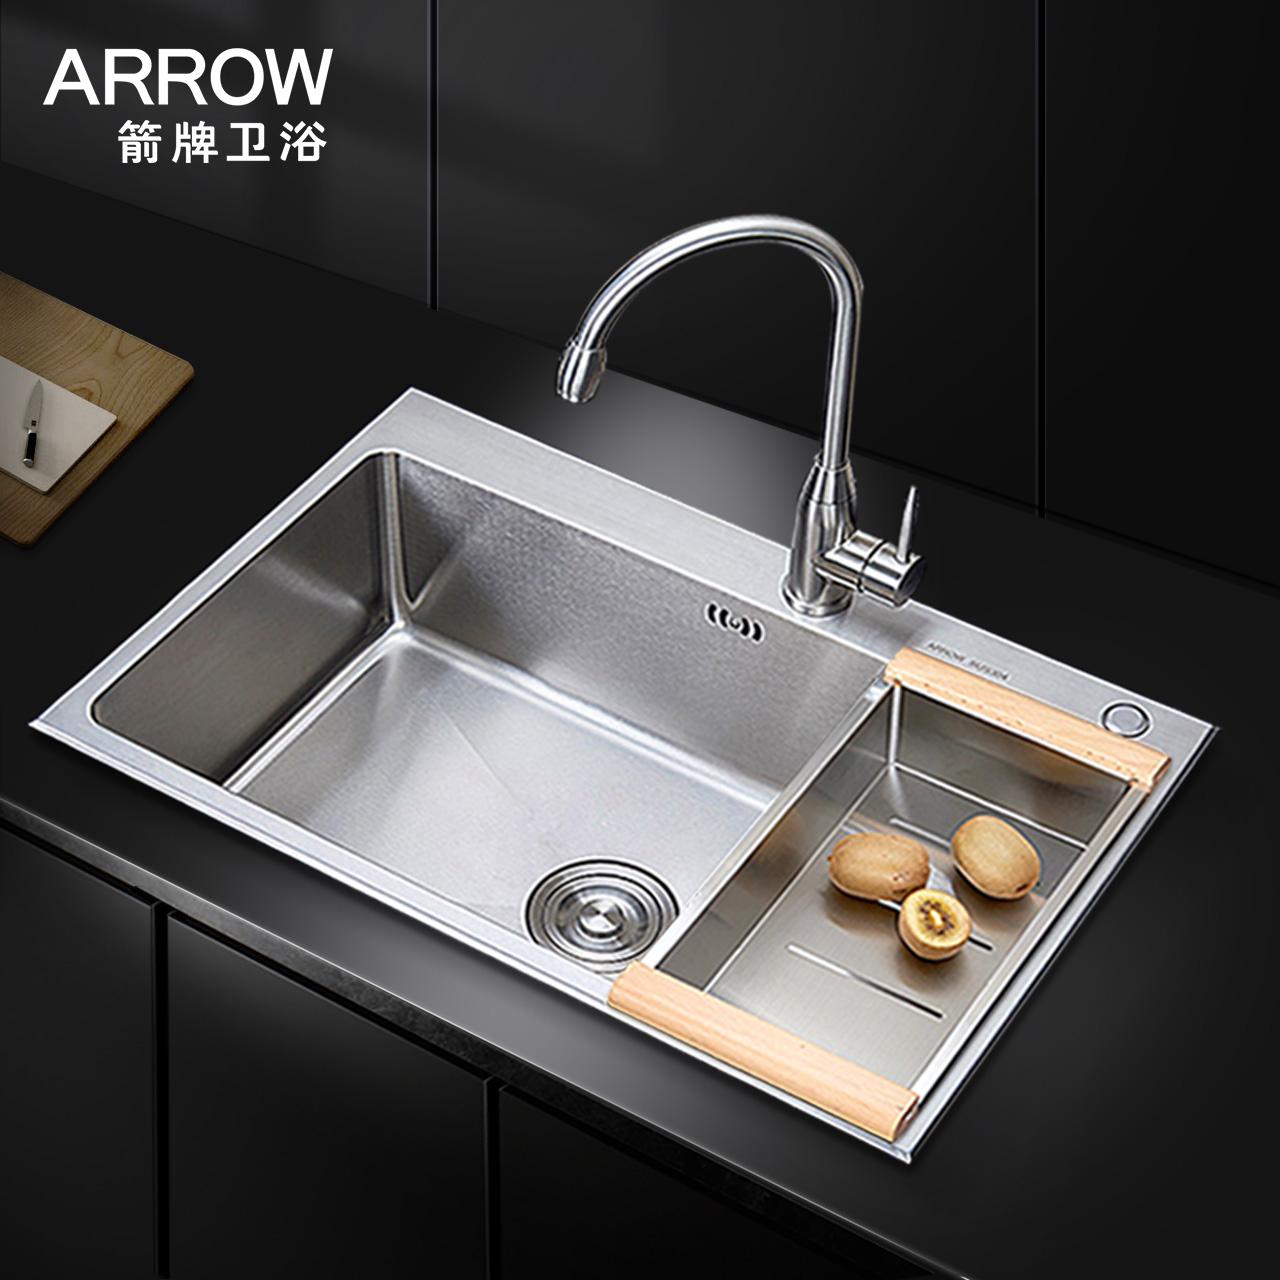 arrow-箭牌水槽 手工不锈钢超大手工单槽套装台下台上厨房洗菜盆